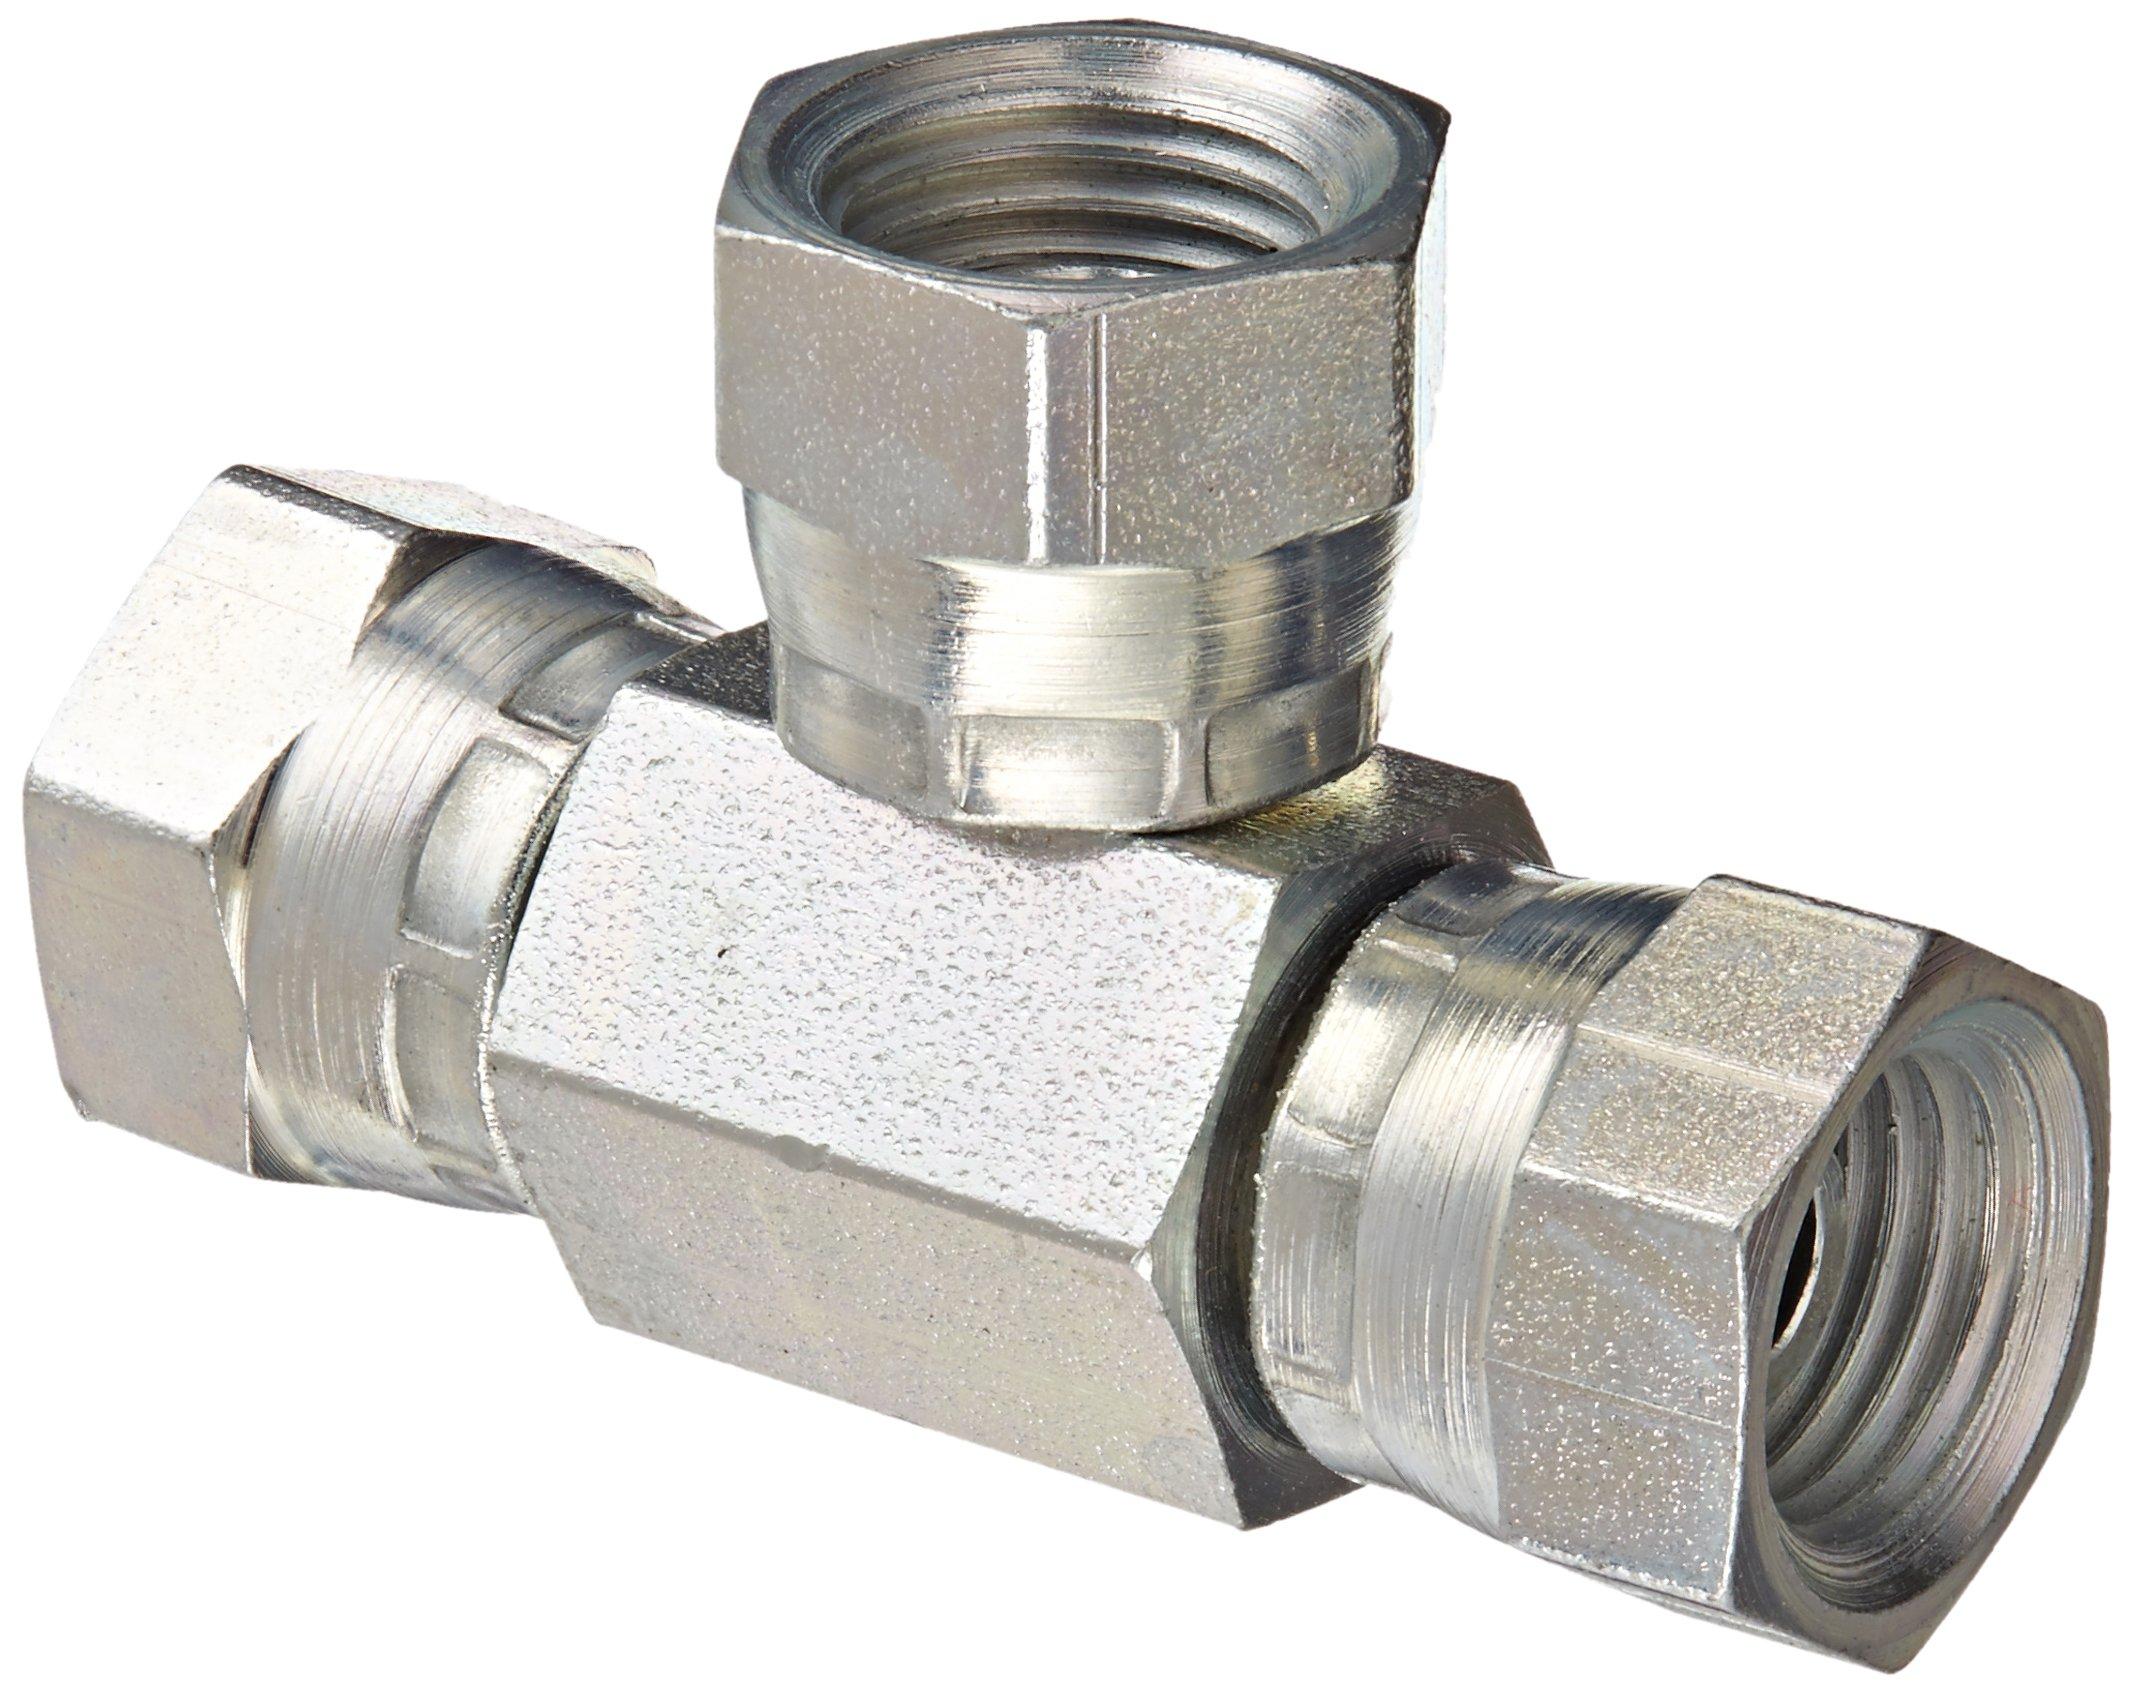 Eaton Weatherhead 9705X4X4X4 Carbon Steel Fitting, Swivel, Tee, 1/4''NPSM Female